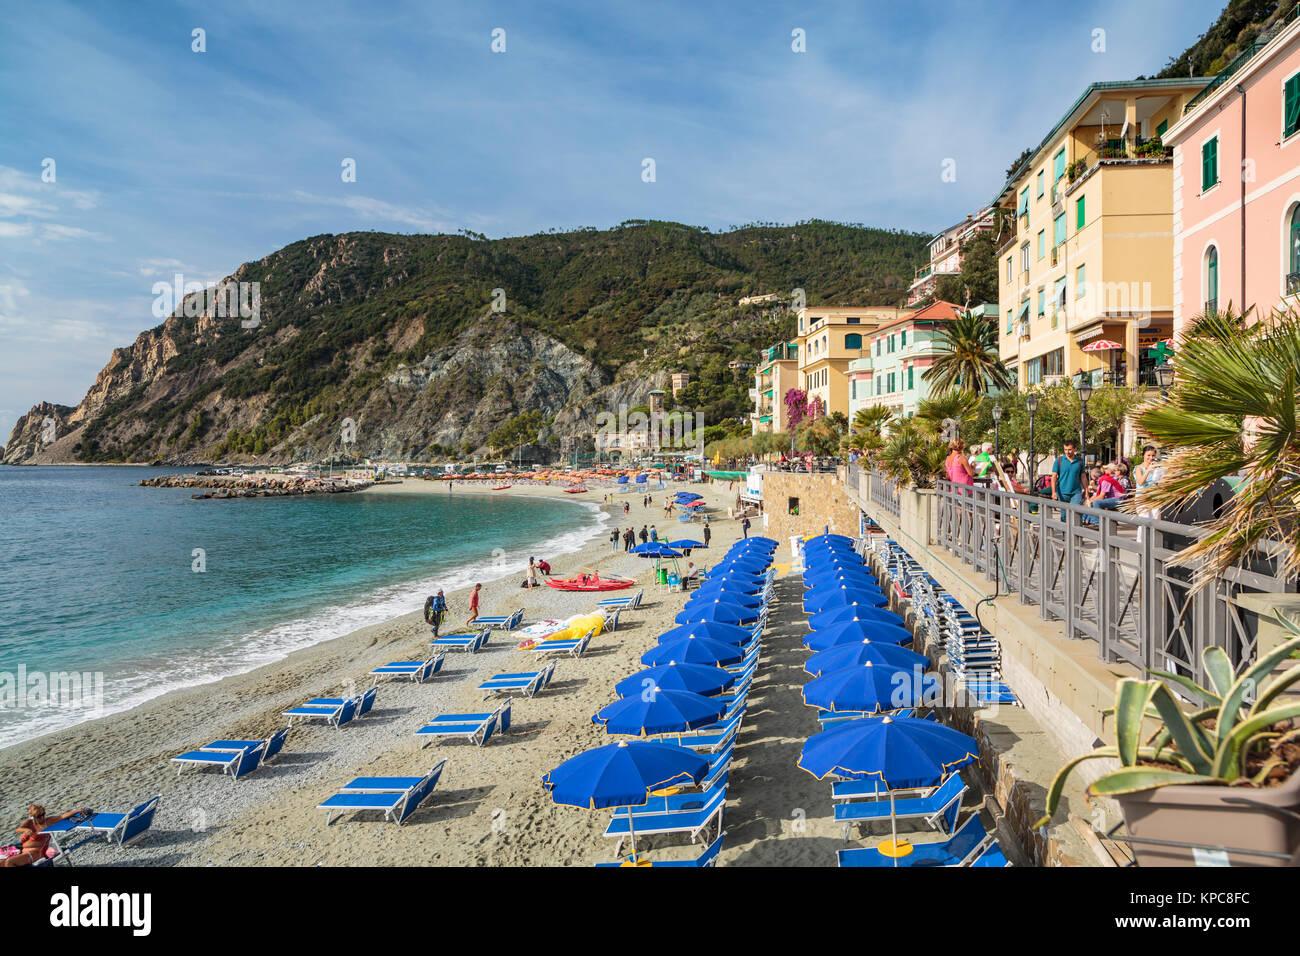 The sandy beach with blue umbrellas in Monterosso al Mare, Liguria, Italy, Europe. - Stock Image